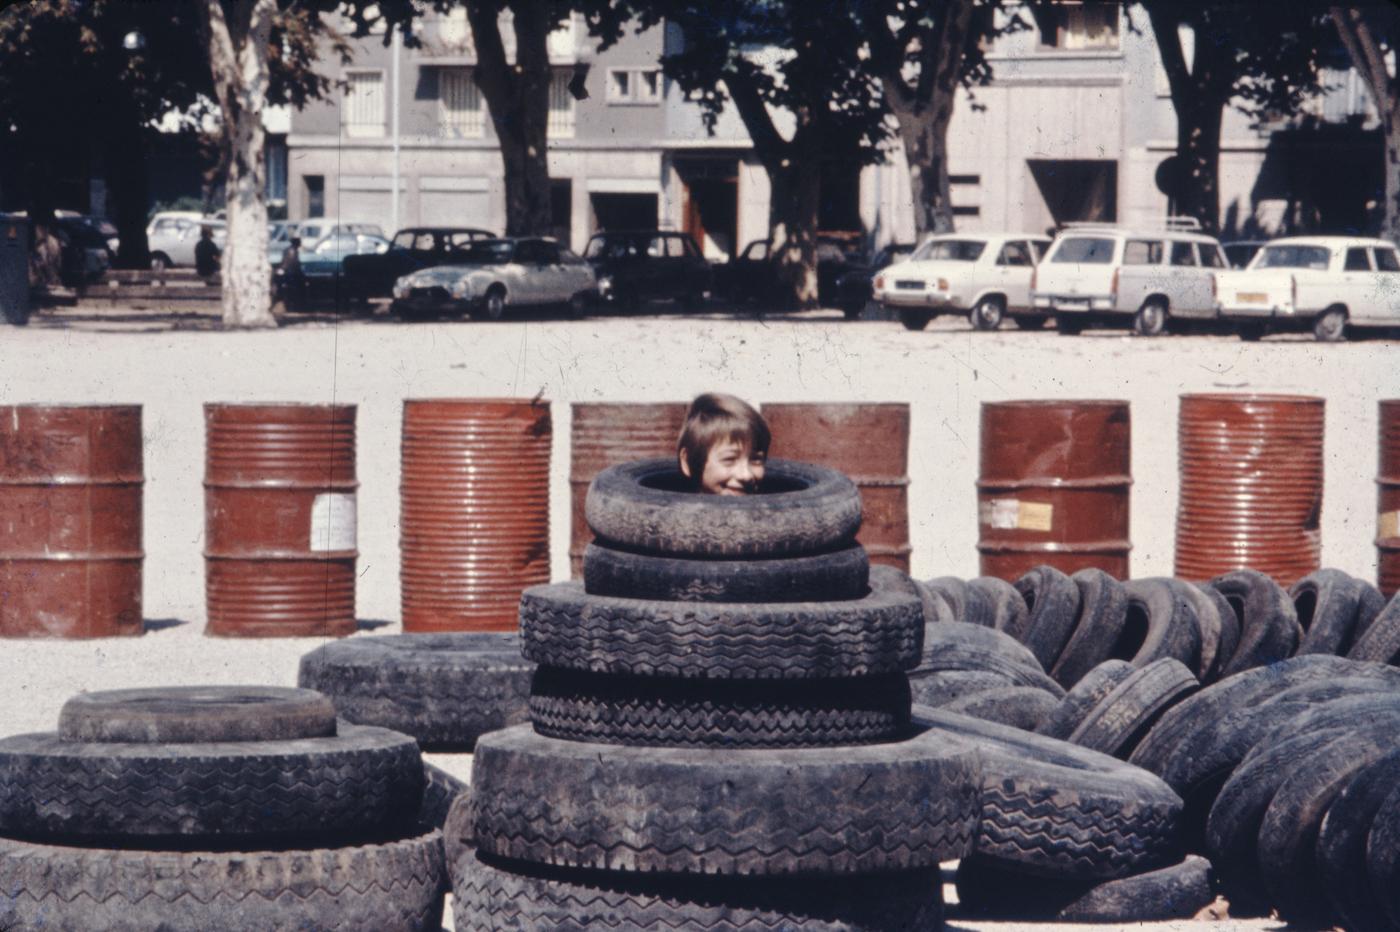 Group Ludic, Adventure playground Chalons-sur-Saône, France (1973) (courtesy of Xavier de la Salle)